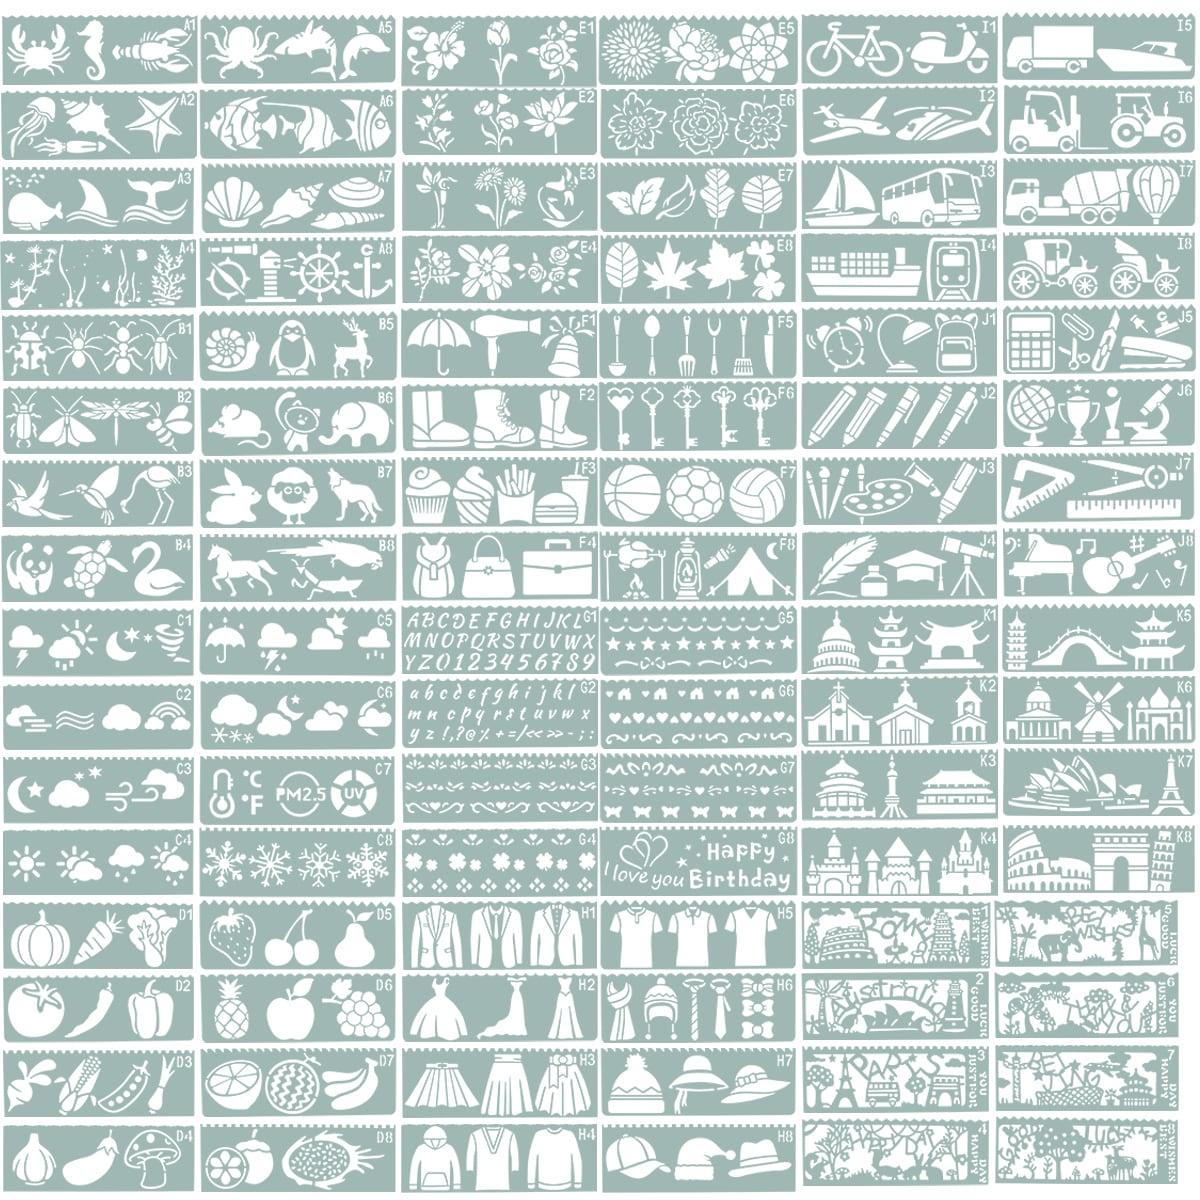 YNAK ステンシルシート テンプレート 型 大容量 96枚 ステンシル筆 セット 花柄 動物 アルファベット 数字 など メッセージカード グリーティングカード ジャーナルカード スクラップブッキング 日記 DIY 制作